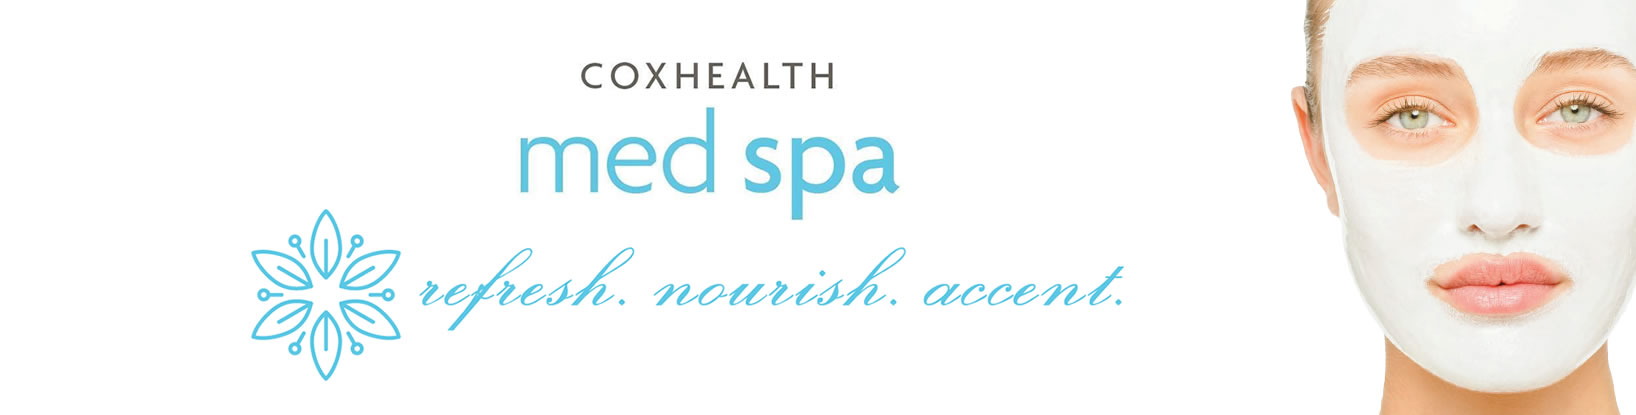 coxhealth-medspa-header-logo-background-cropped-1635x415